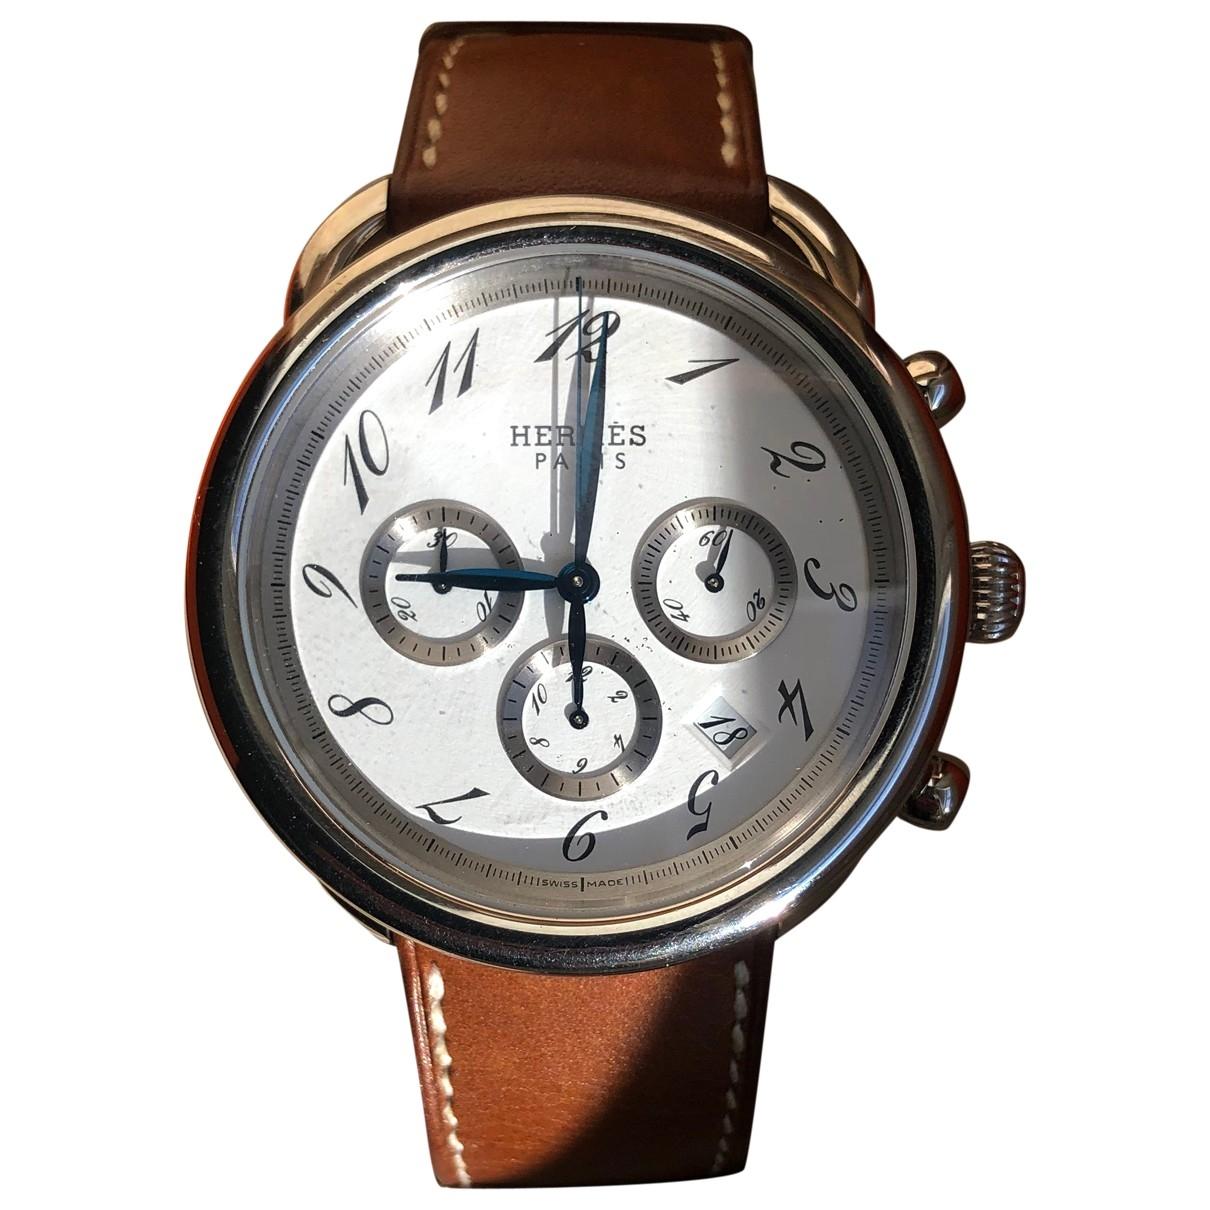 Hermes Arceau Chronographe Uhr in  Braun Stahl